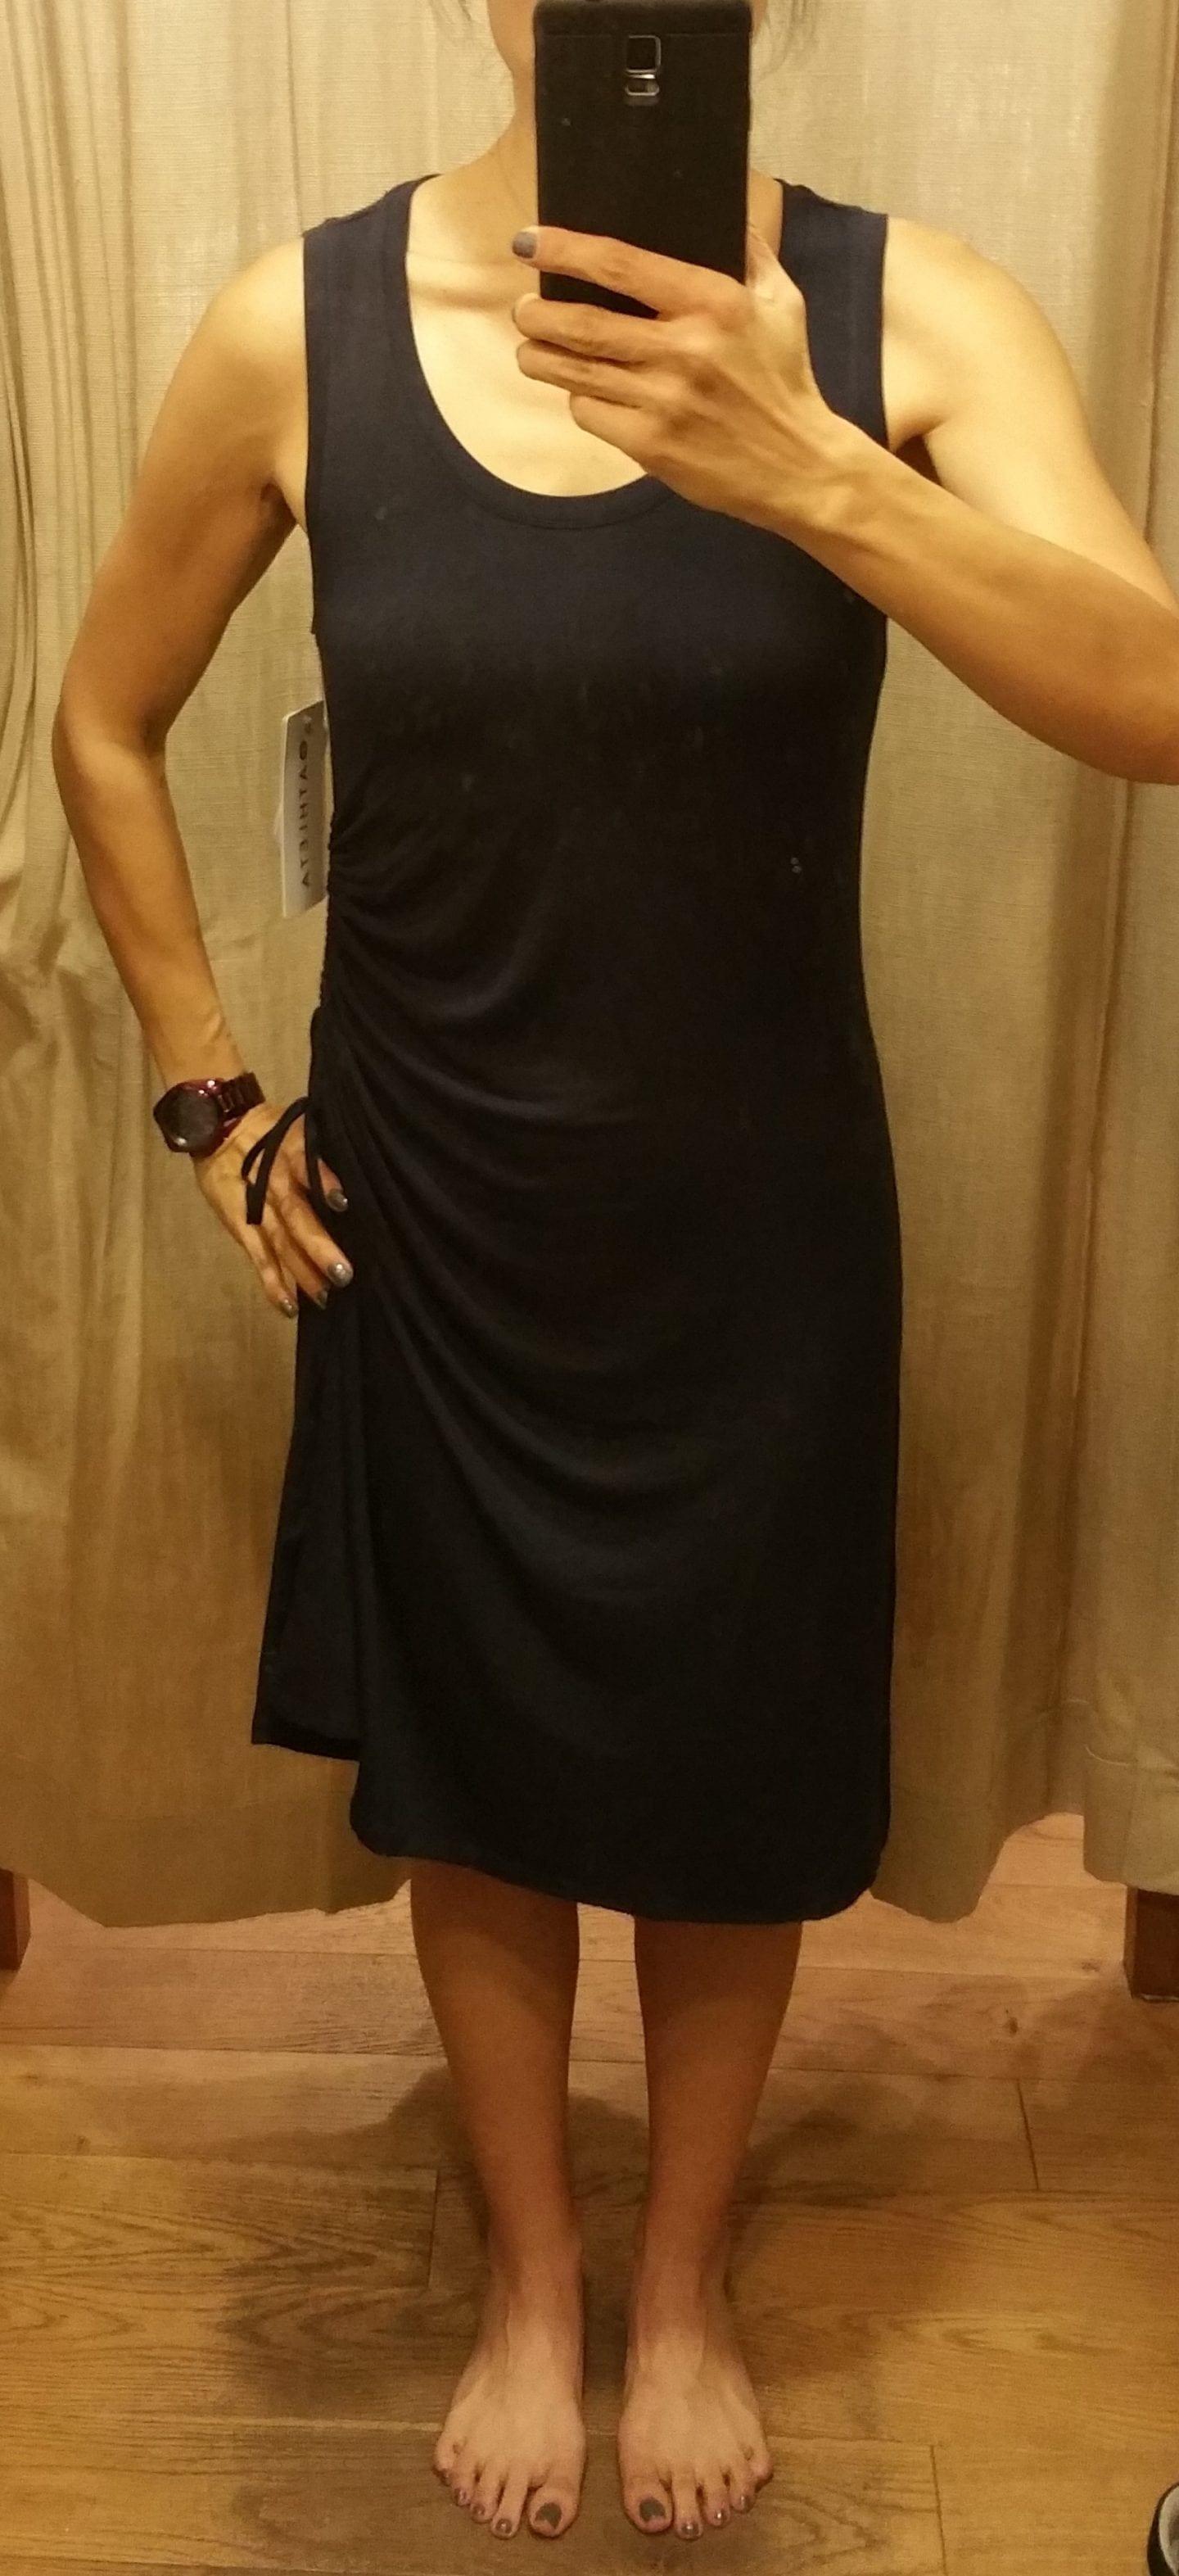 e5b1d6dd45c01 ATHLETA FIT REVIEW (Part 1): Santorini High Neck Printed Dress ...